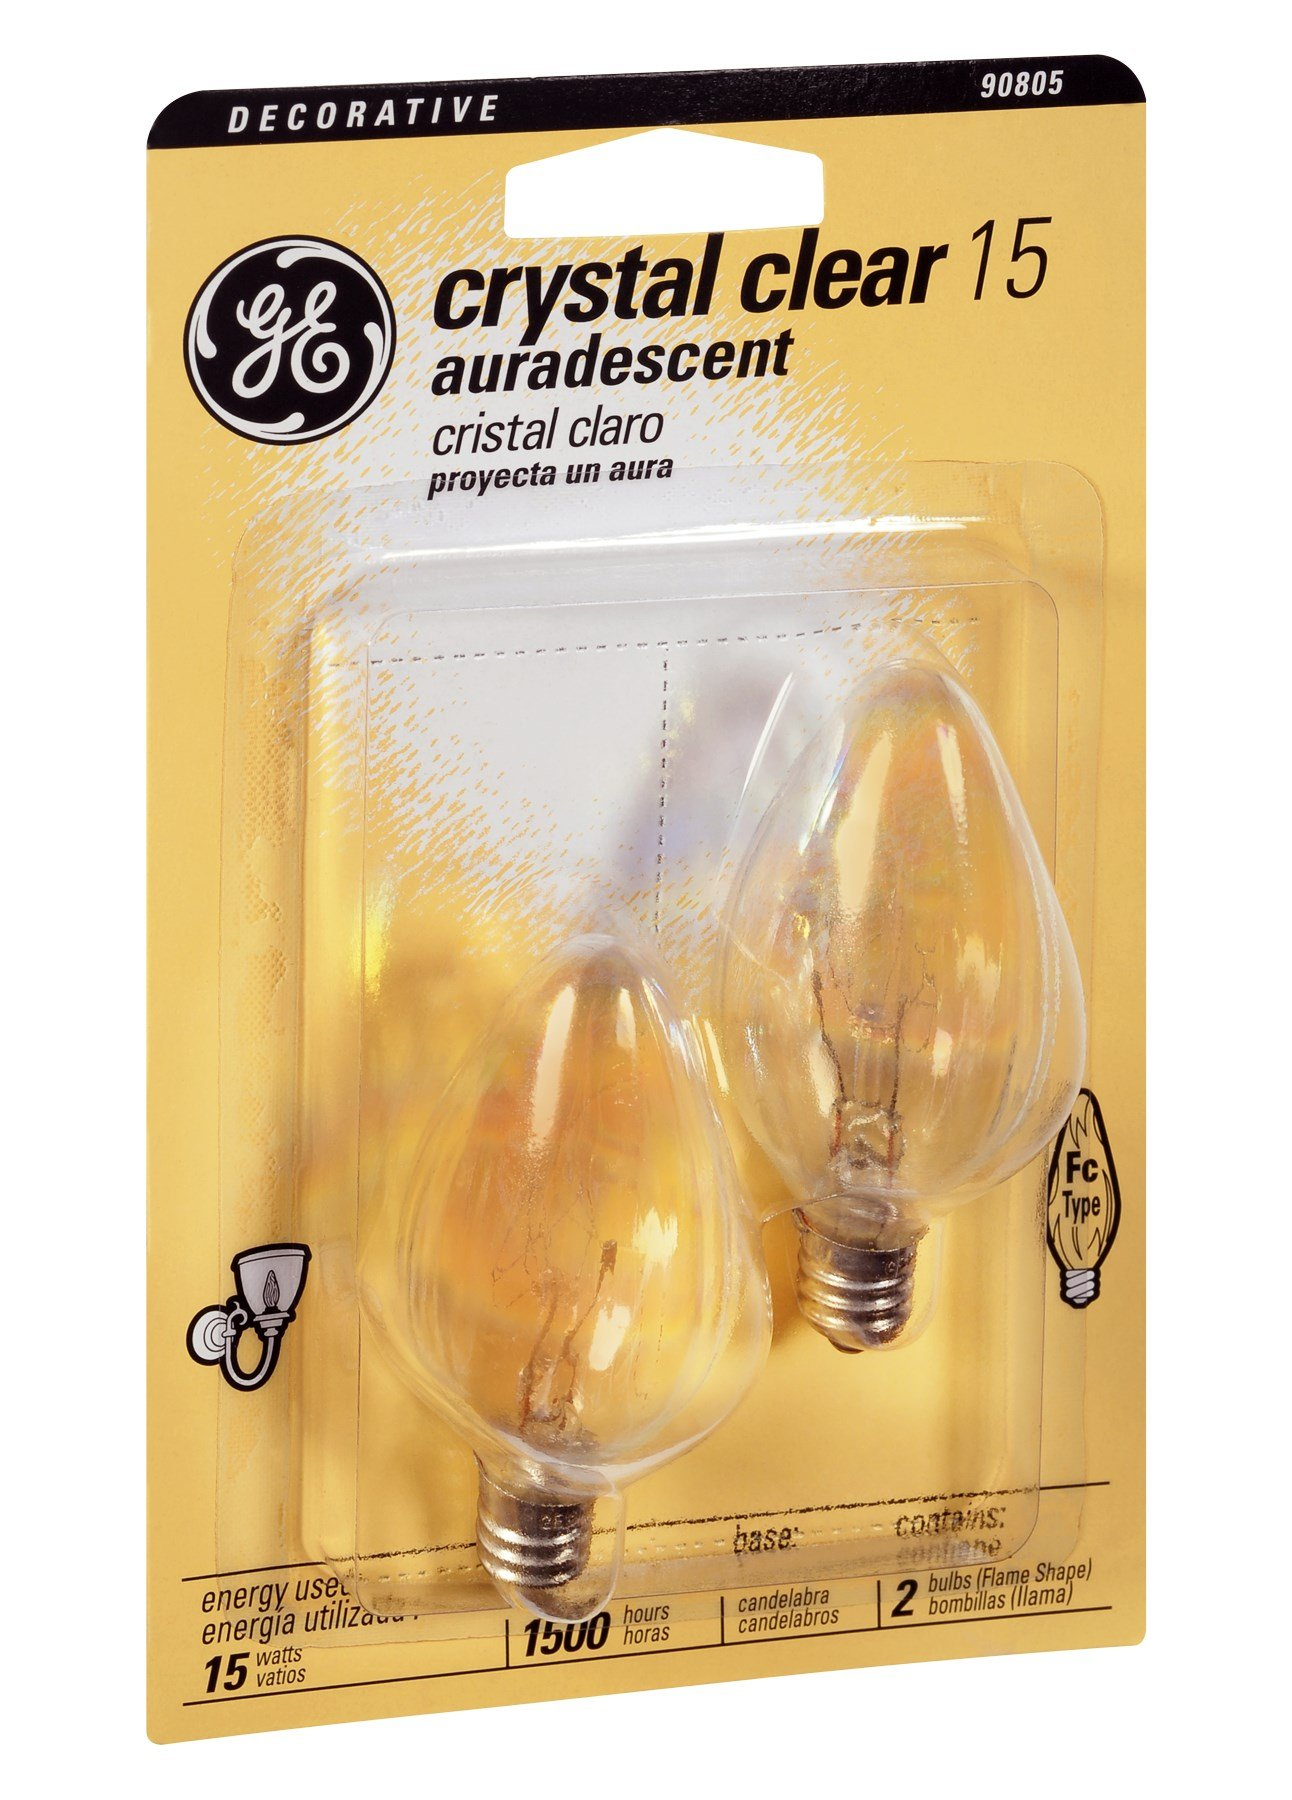 GE Crystal Clear Decorative 15 Watt Fc Candelabra Base Light Bulb 2 CT (Pack of 9)